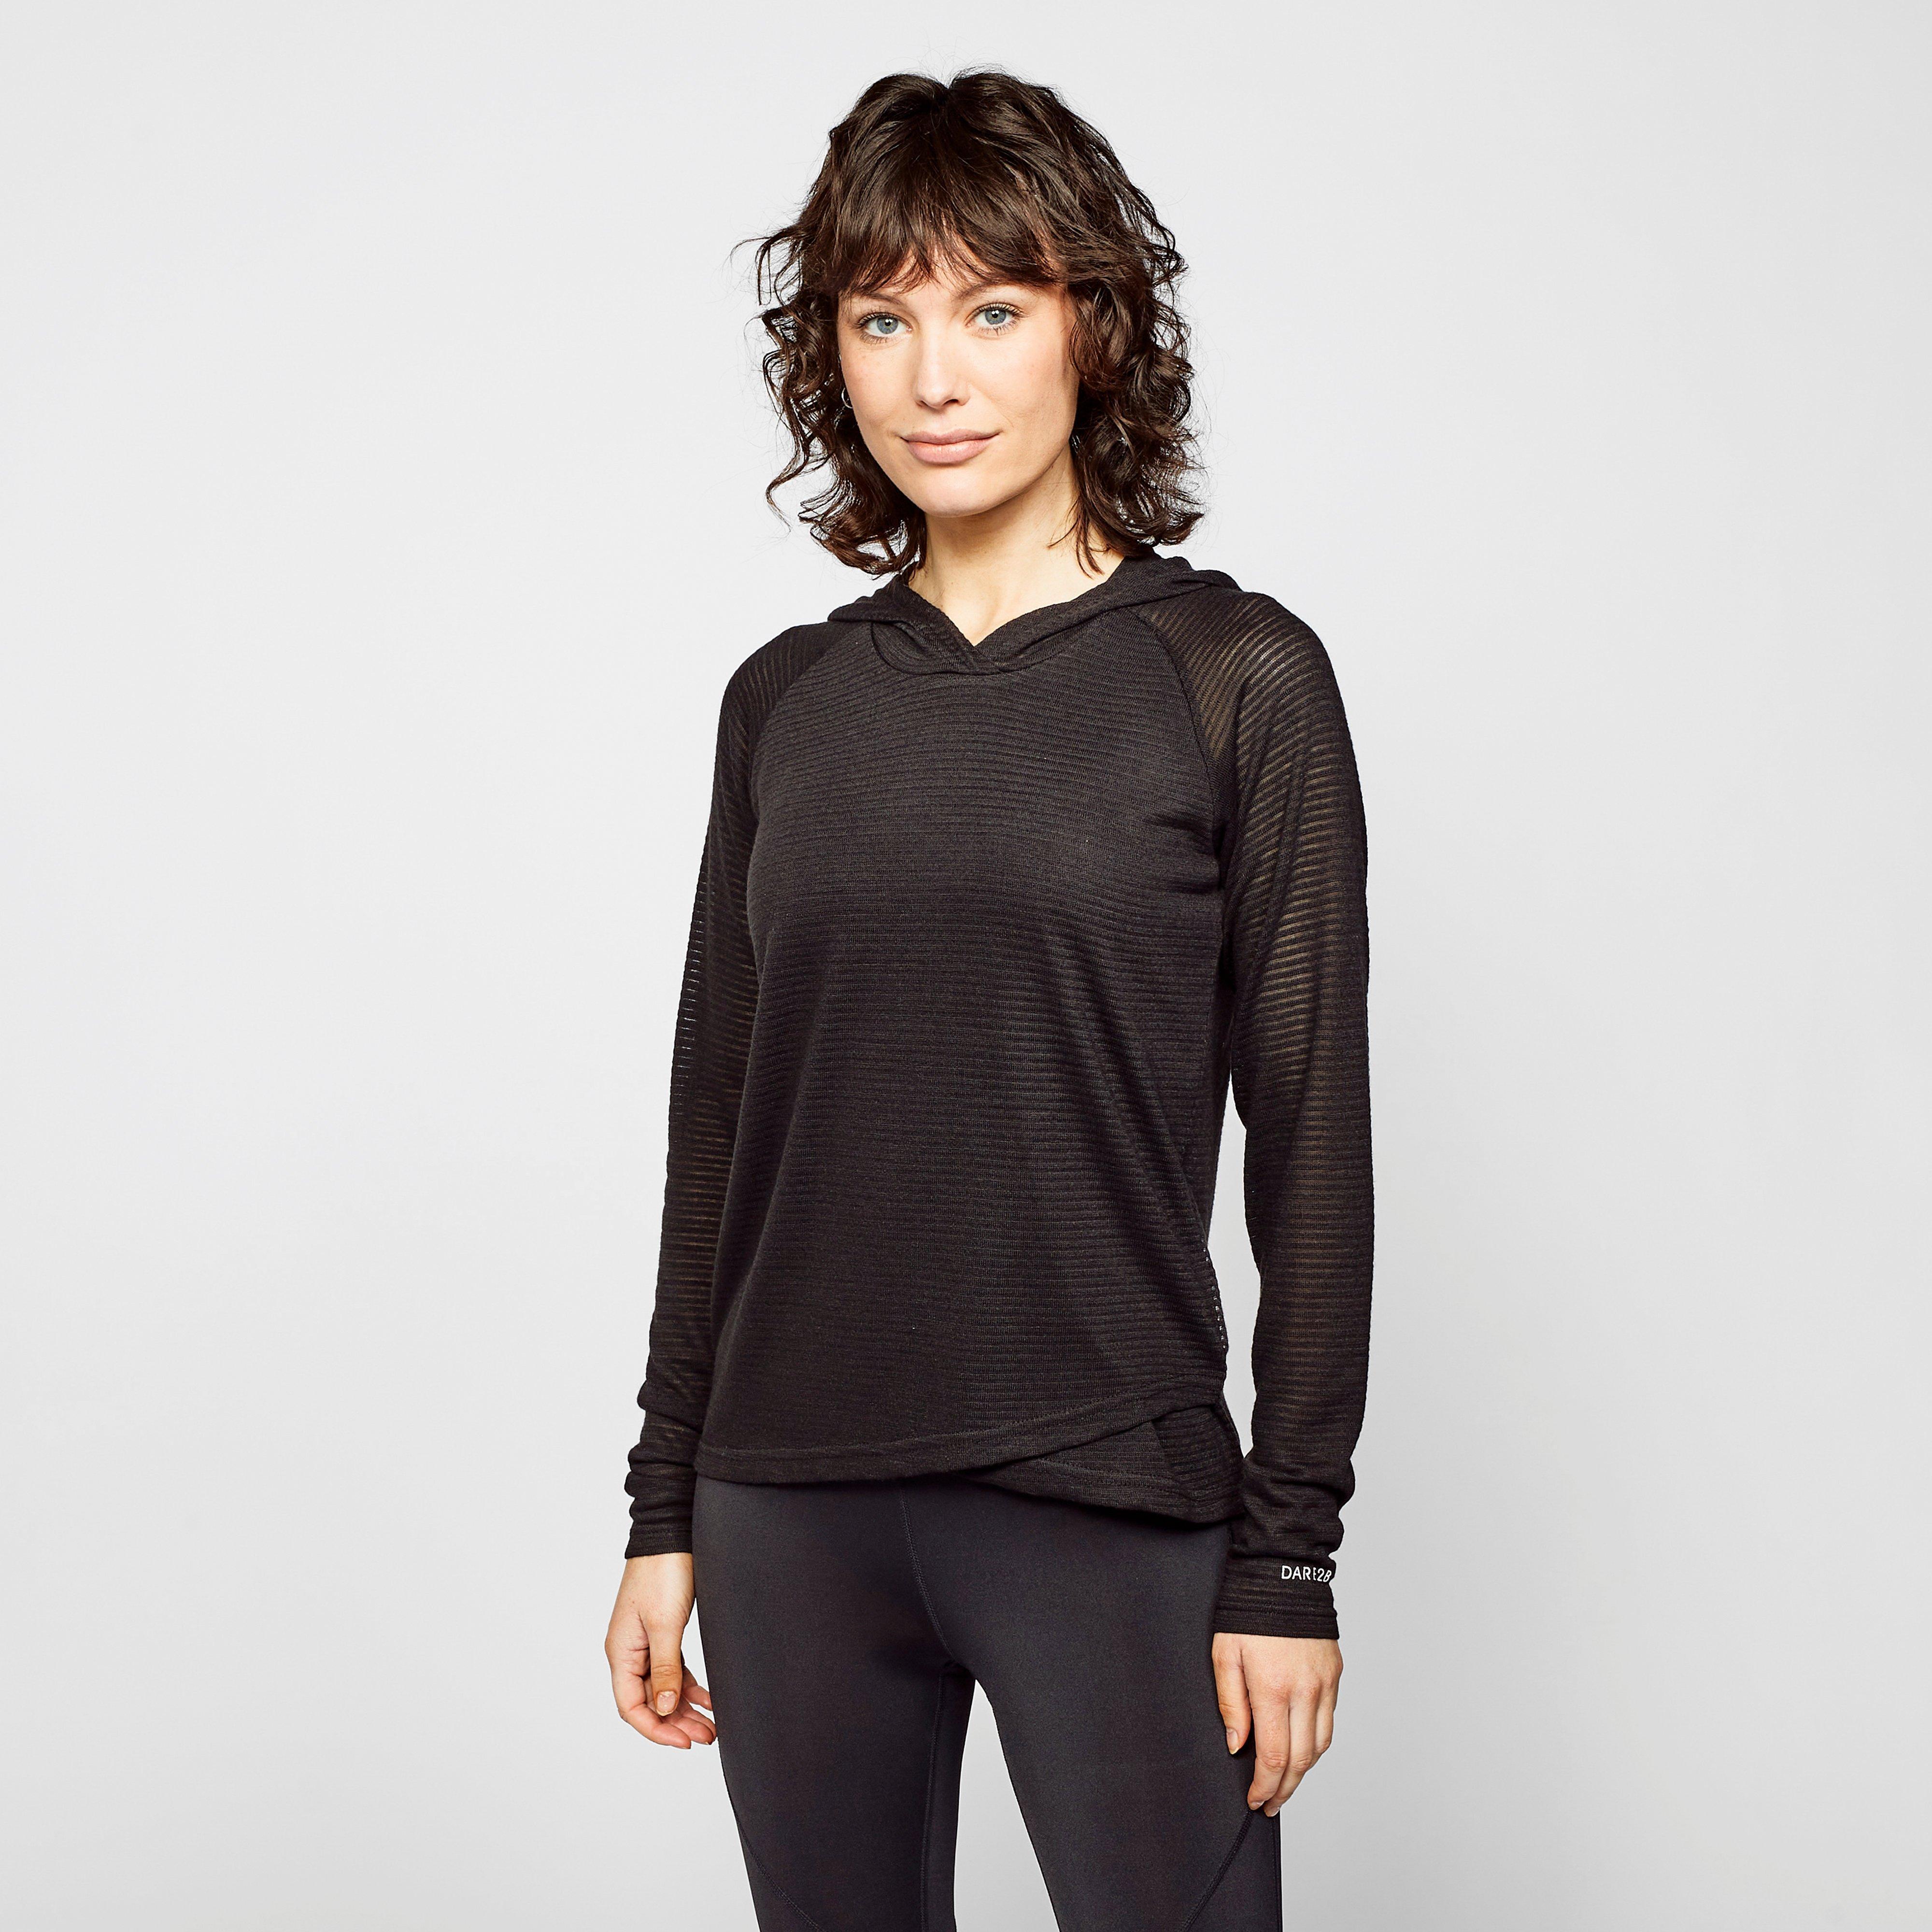 Dare 2B Women's Result Sweater - Black/Blk, Black